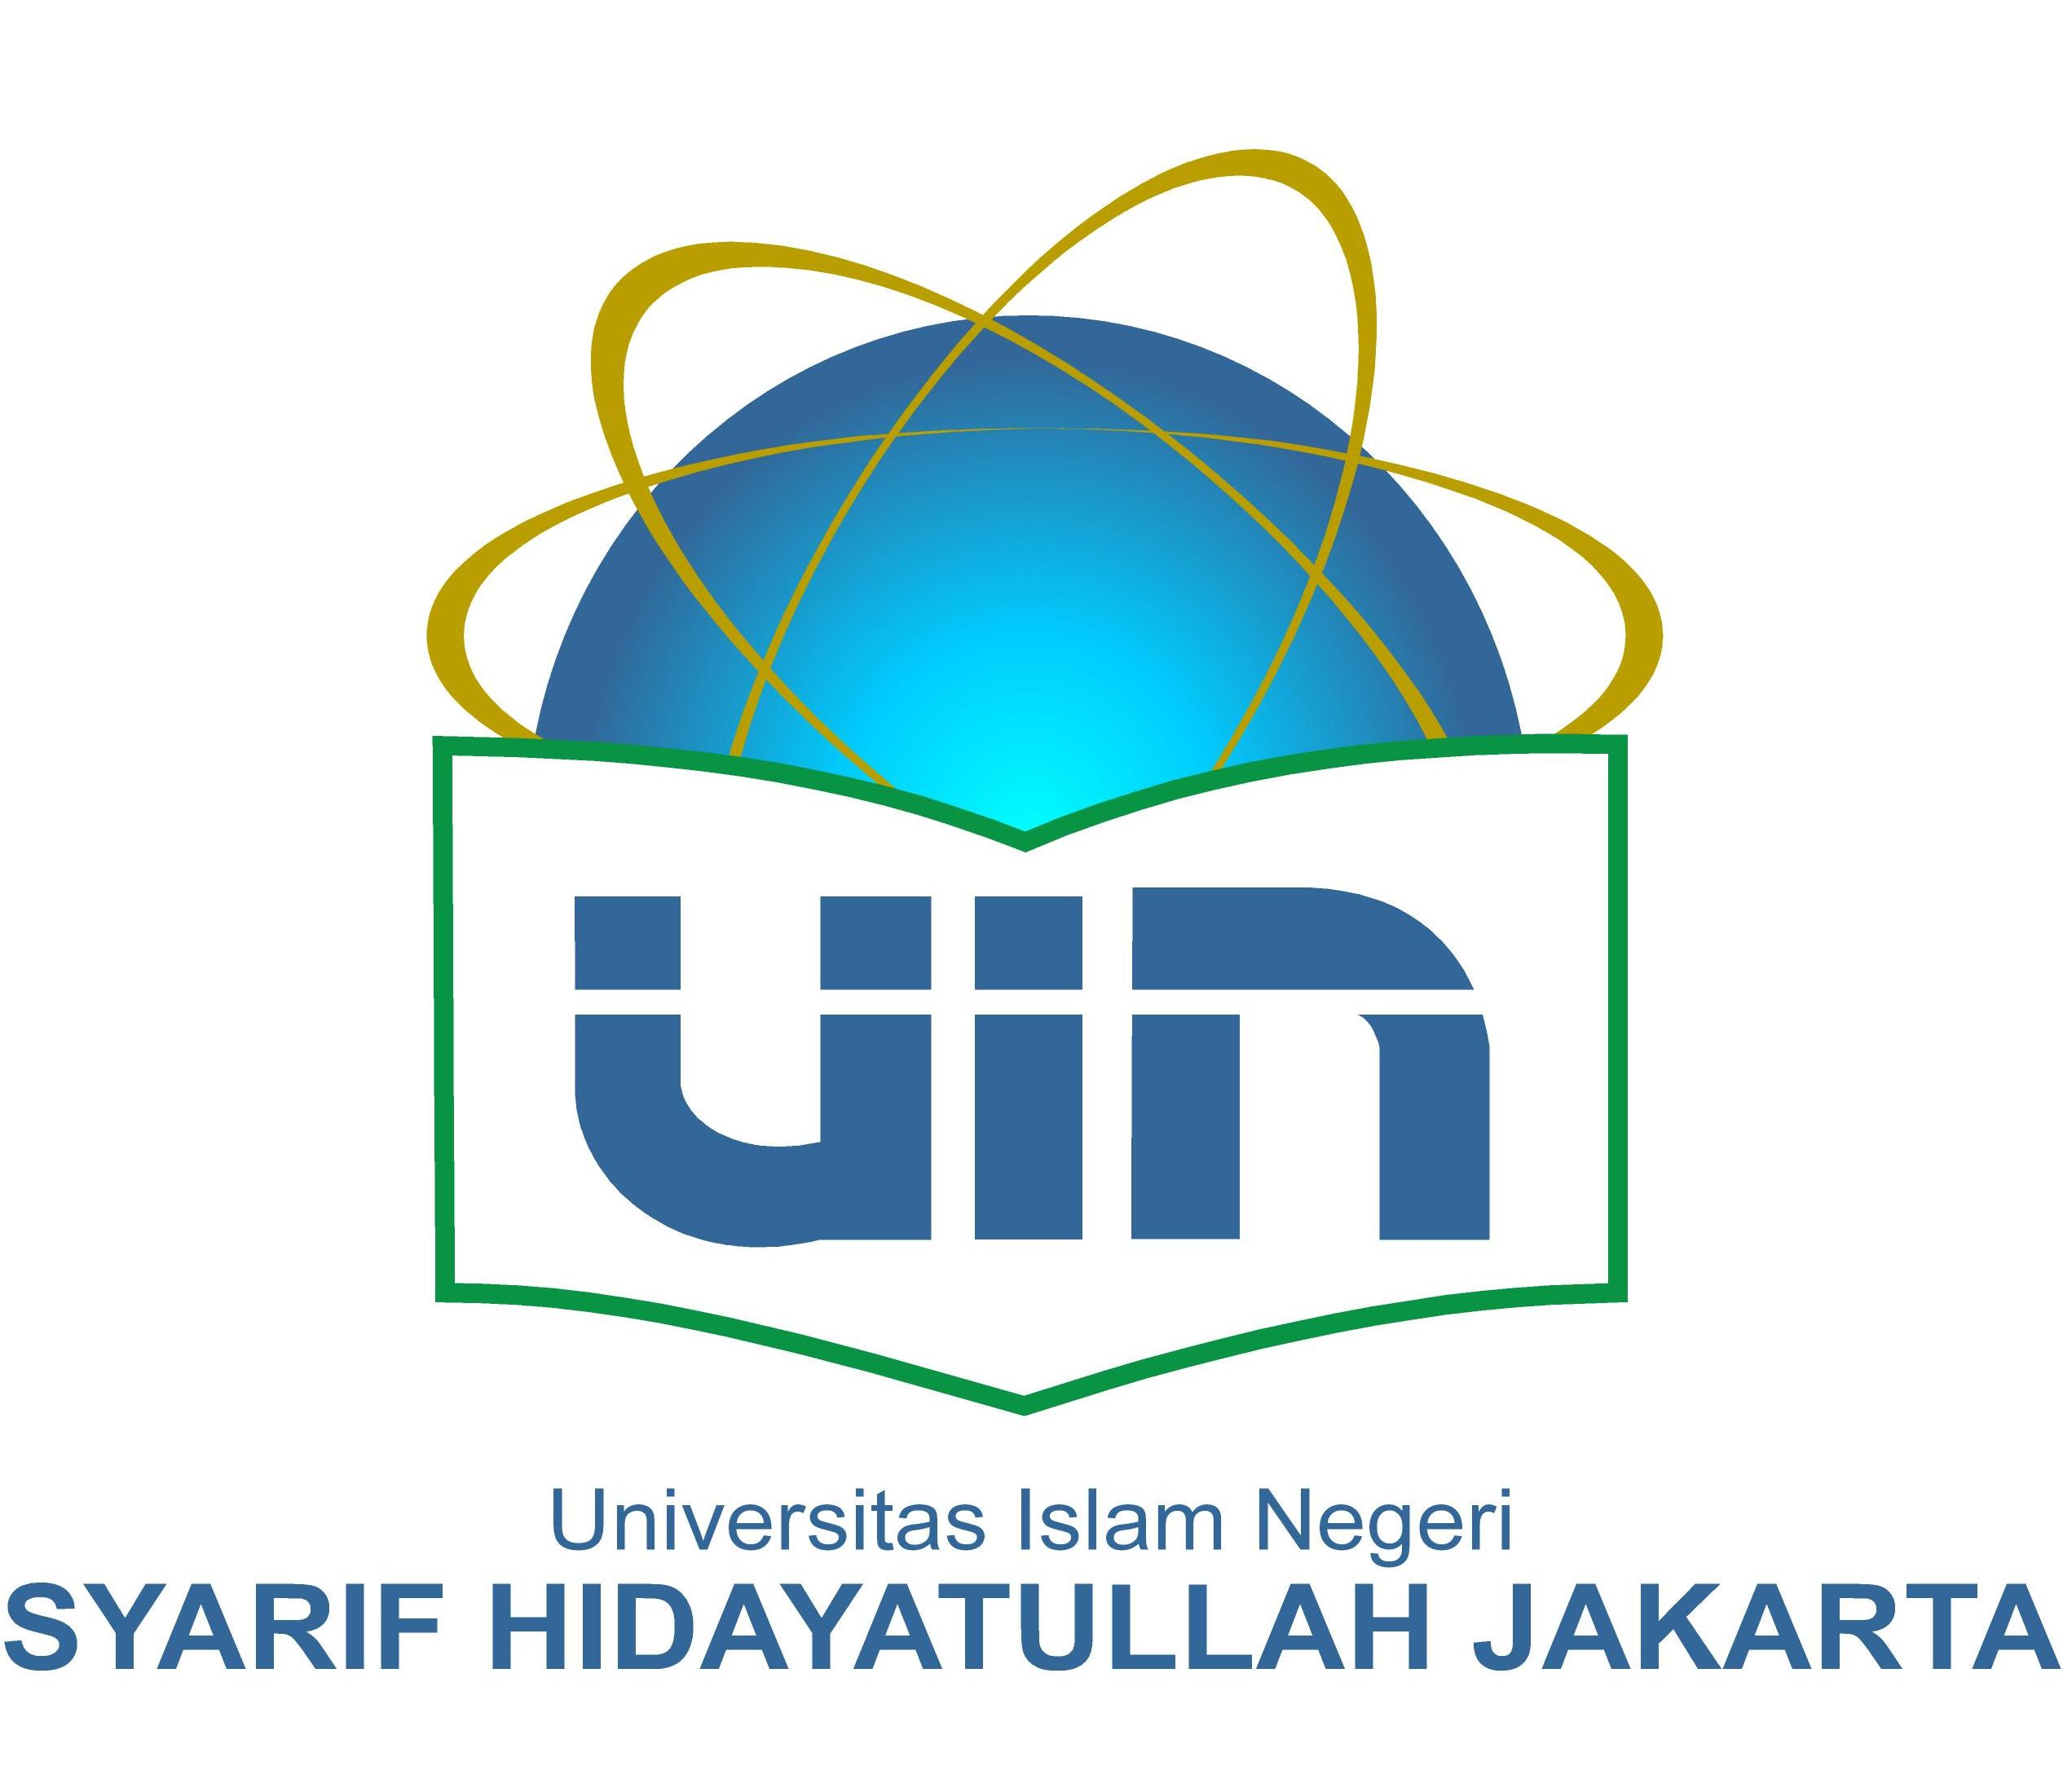 Syarif Hidayatullah State Islamic University Jakarta Wikipedia